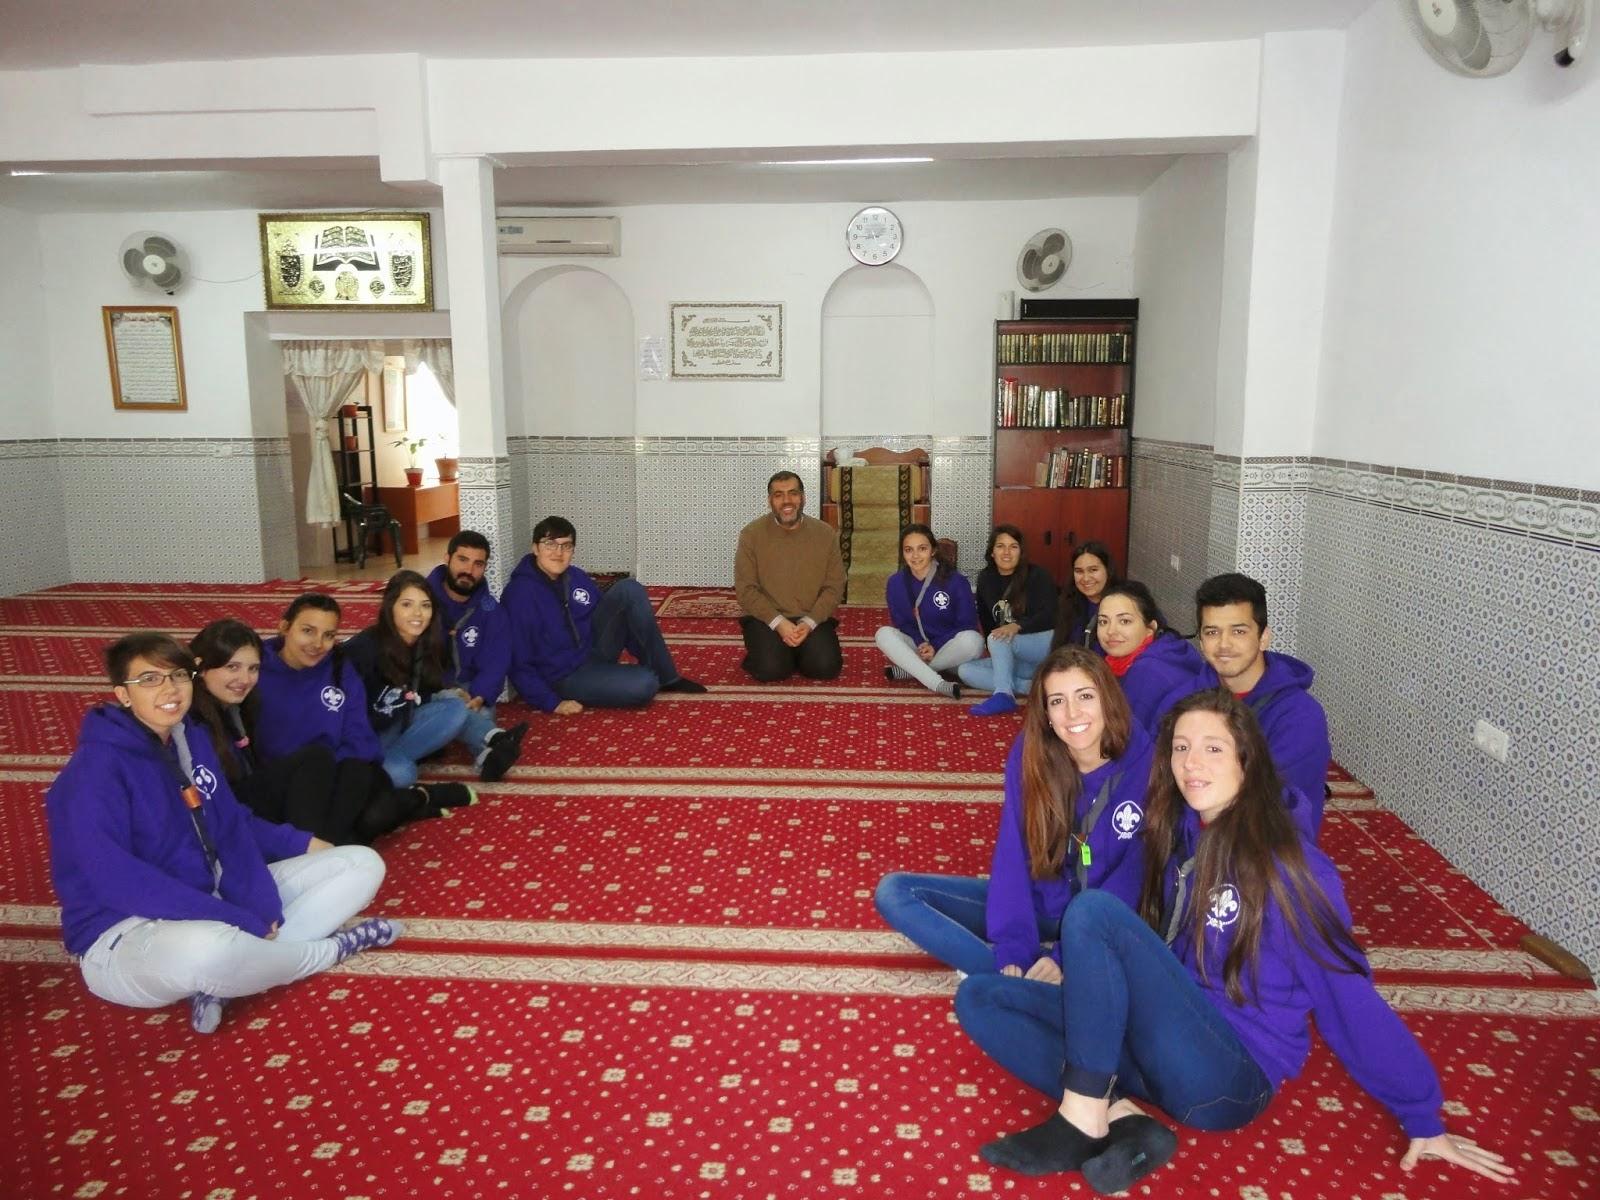 La Mezquita de Badajoz recibe al Grupo Scout 596 Al-Basharnal